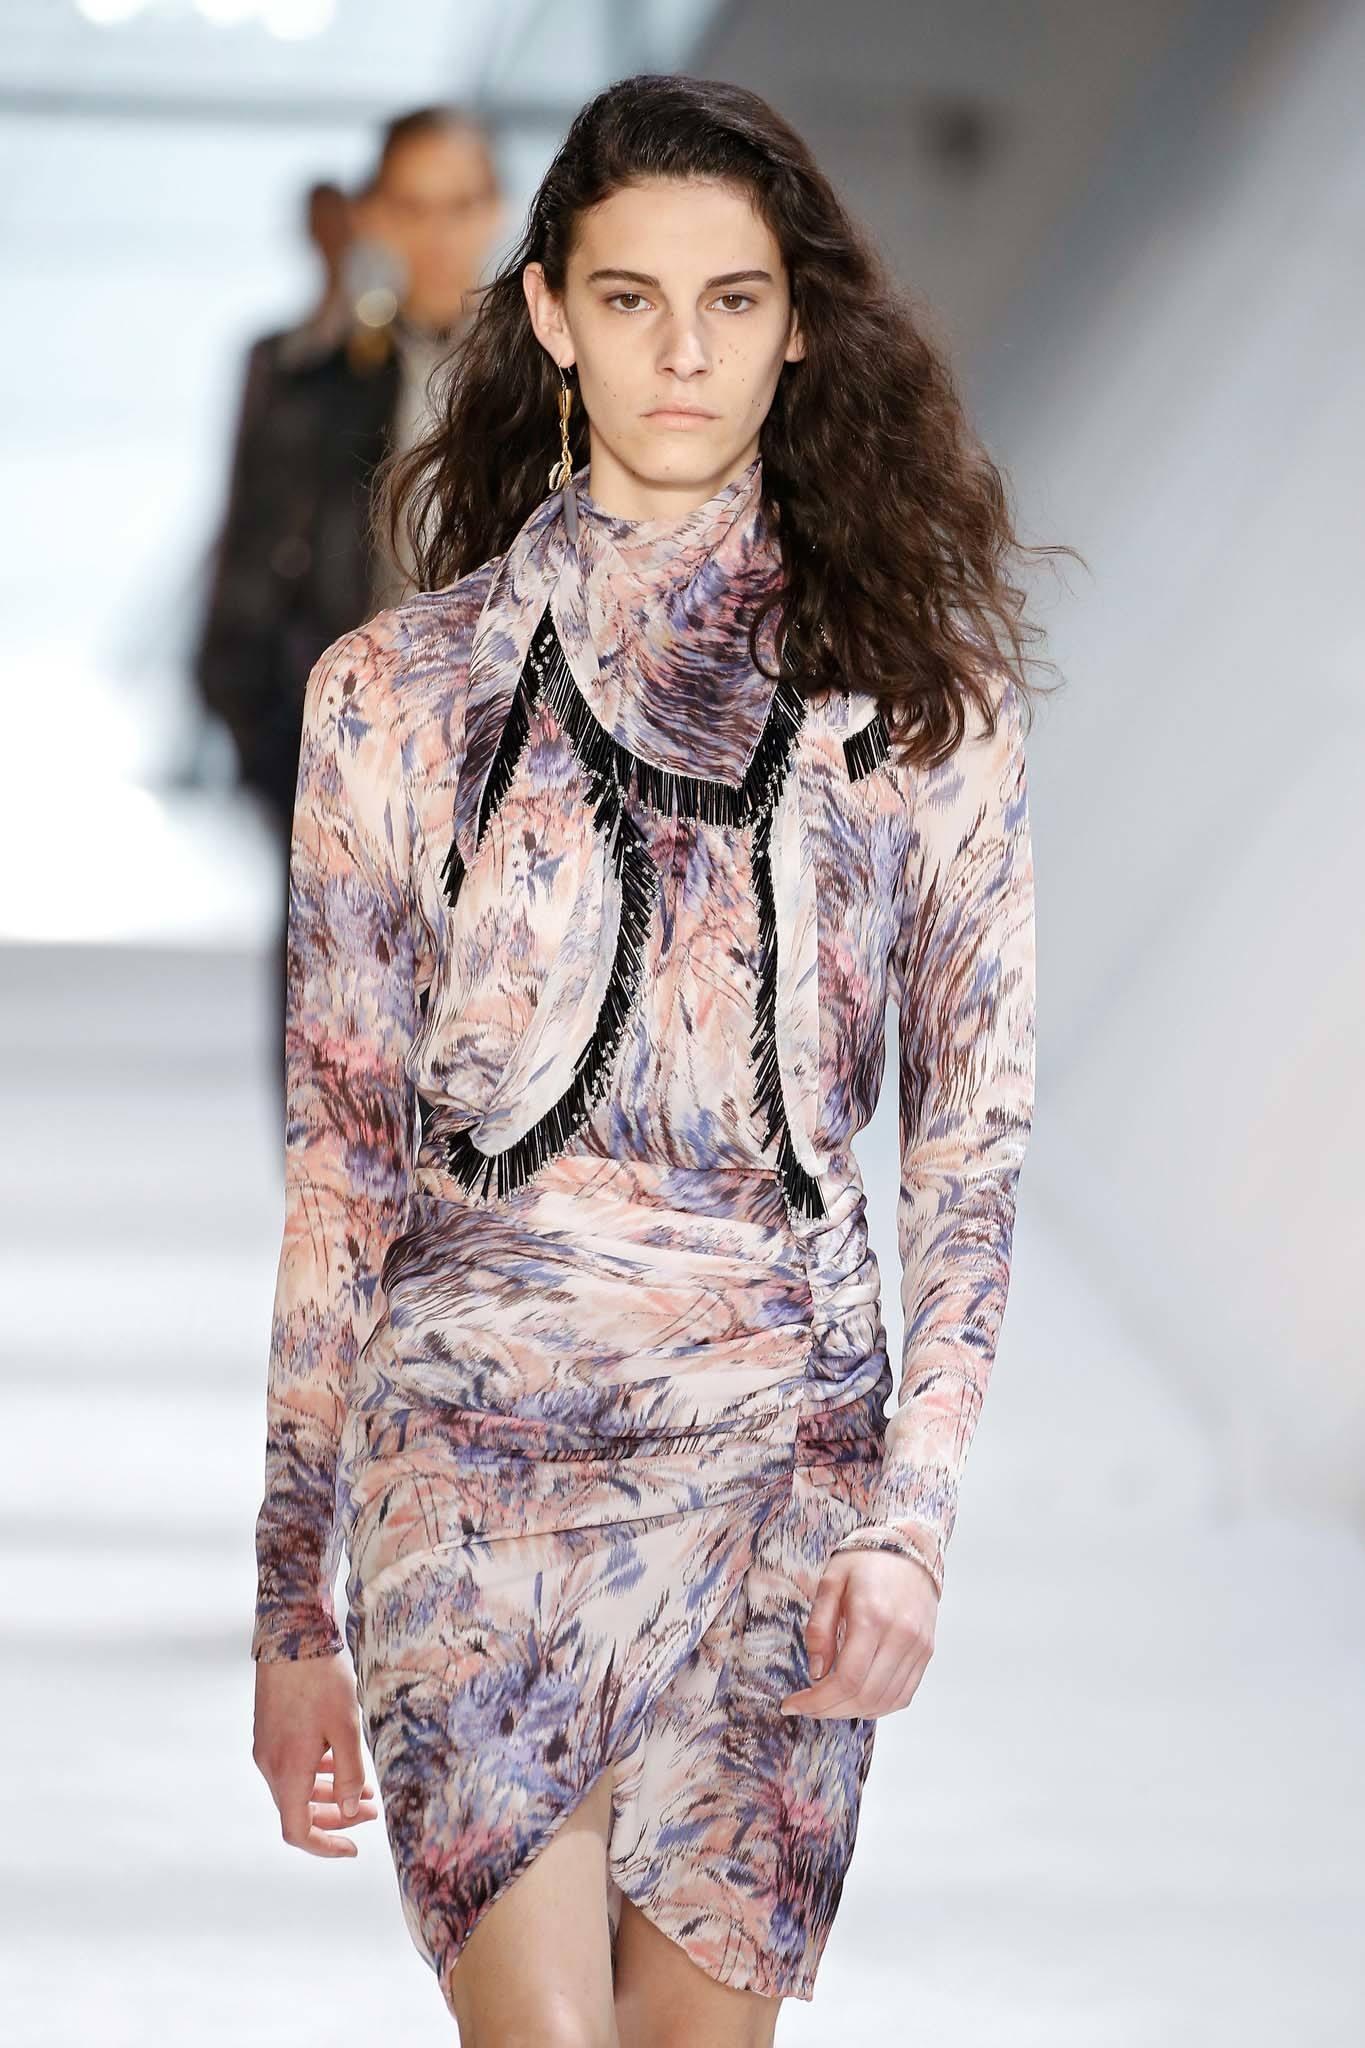 international women's day styles air-dried